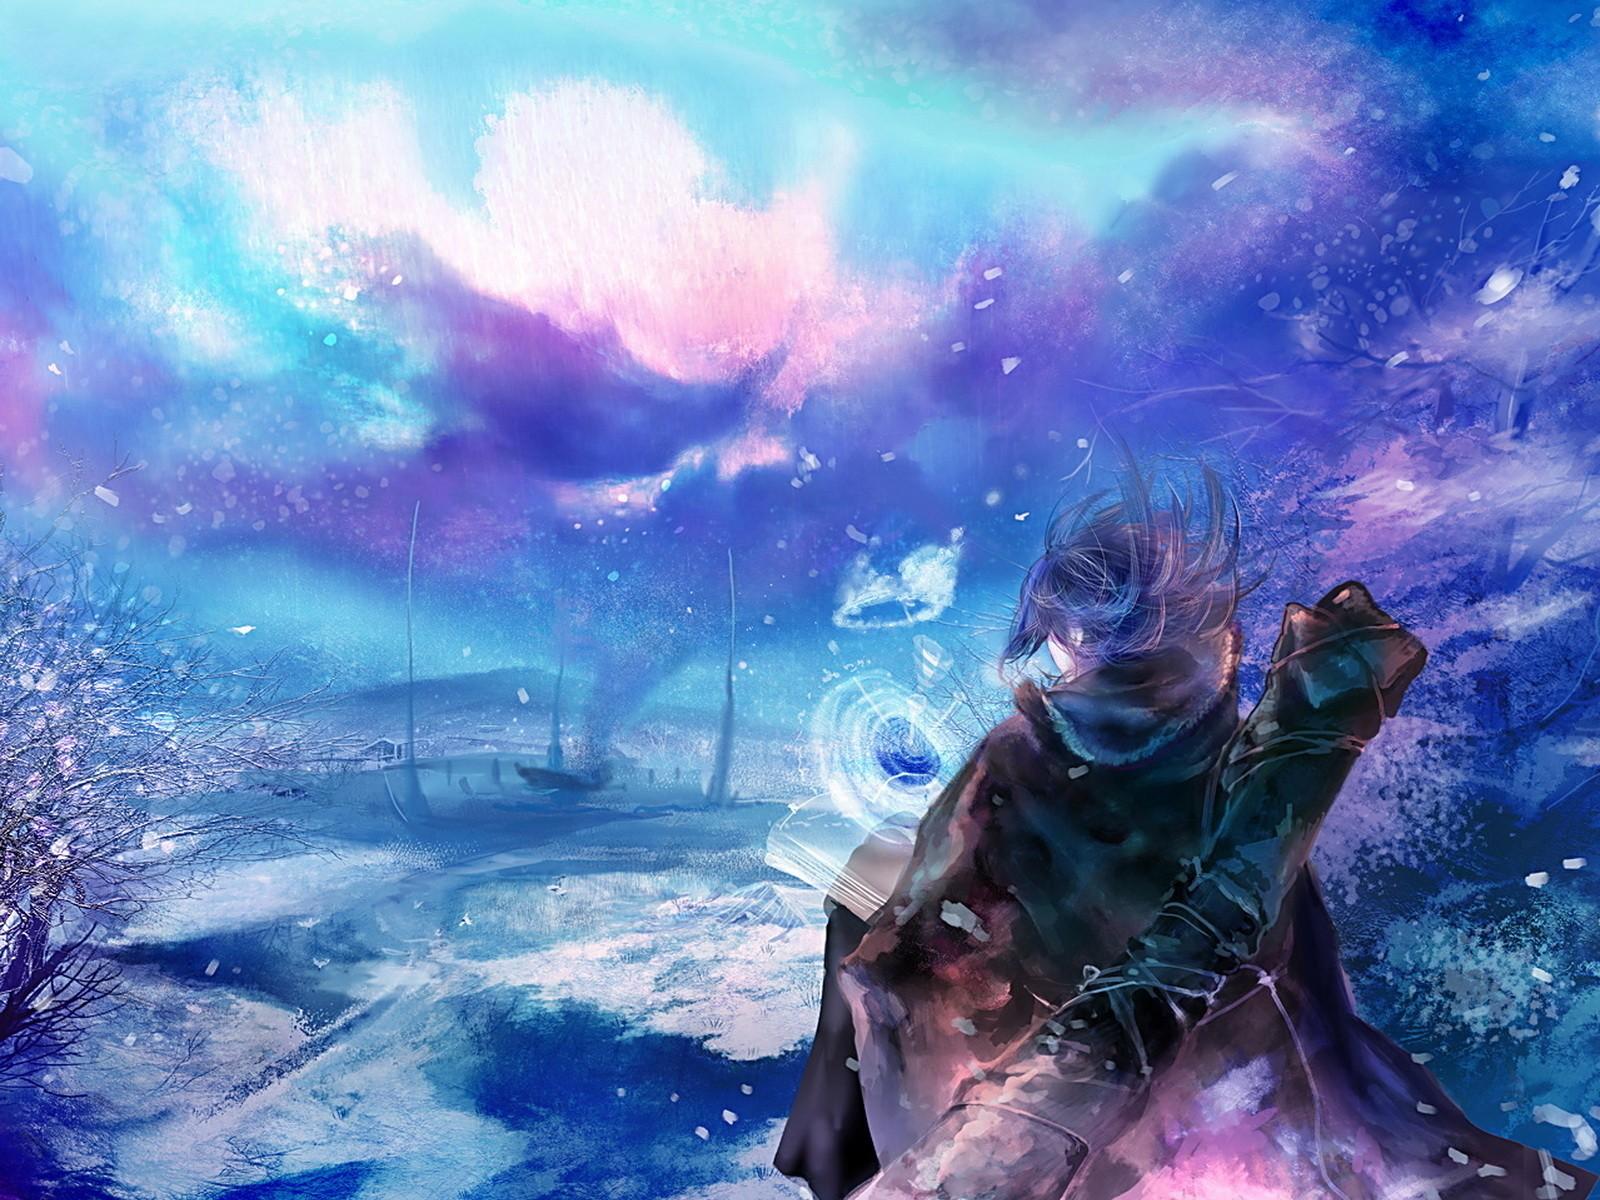 Anime, Anime Girls - Cool Magical Fantasy Anime , HD Wallpaper & Backgrounds